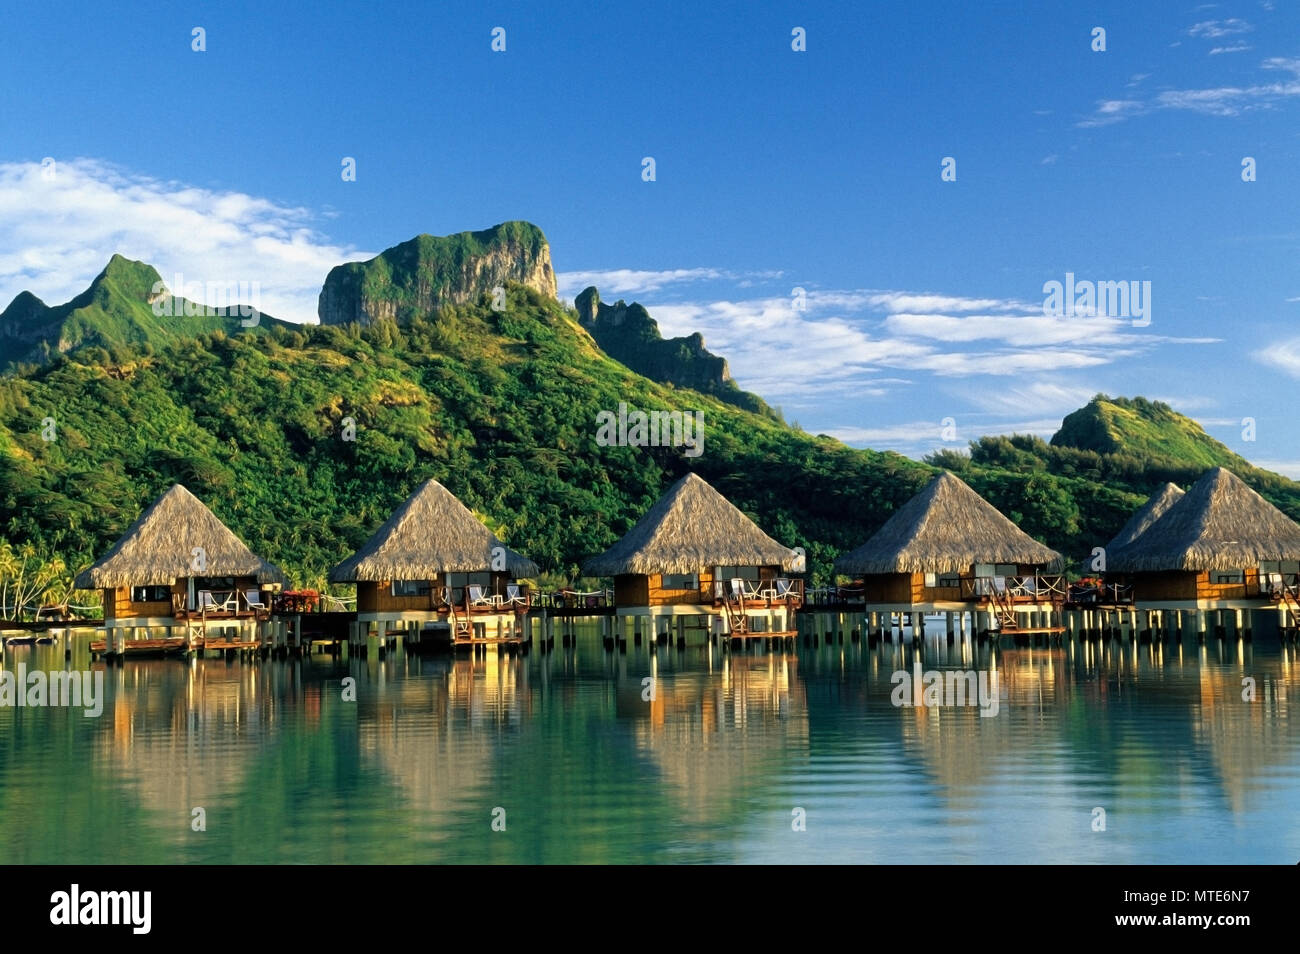 Moana Beach Park Royal Hotel, overwater bungalows, lagoon,  Matira Point,  Bora Bora. Stock Photo